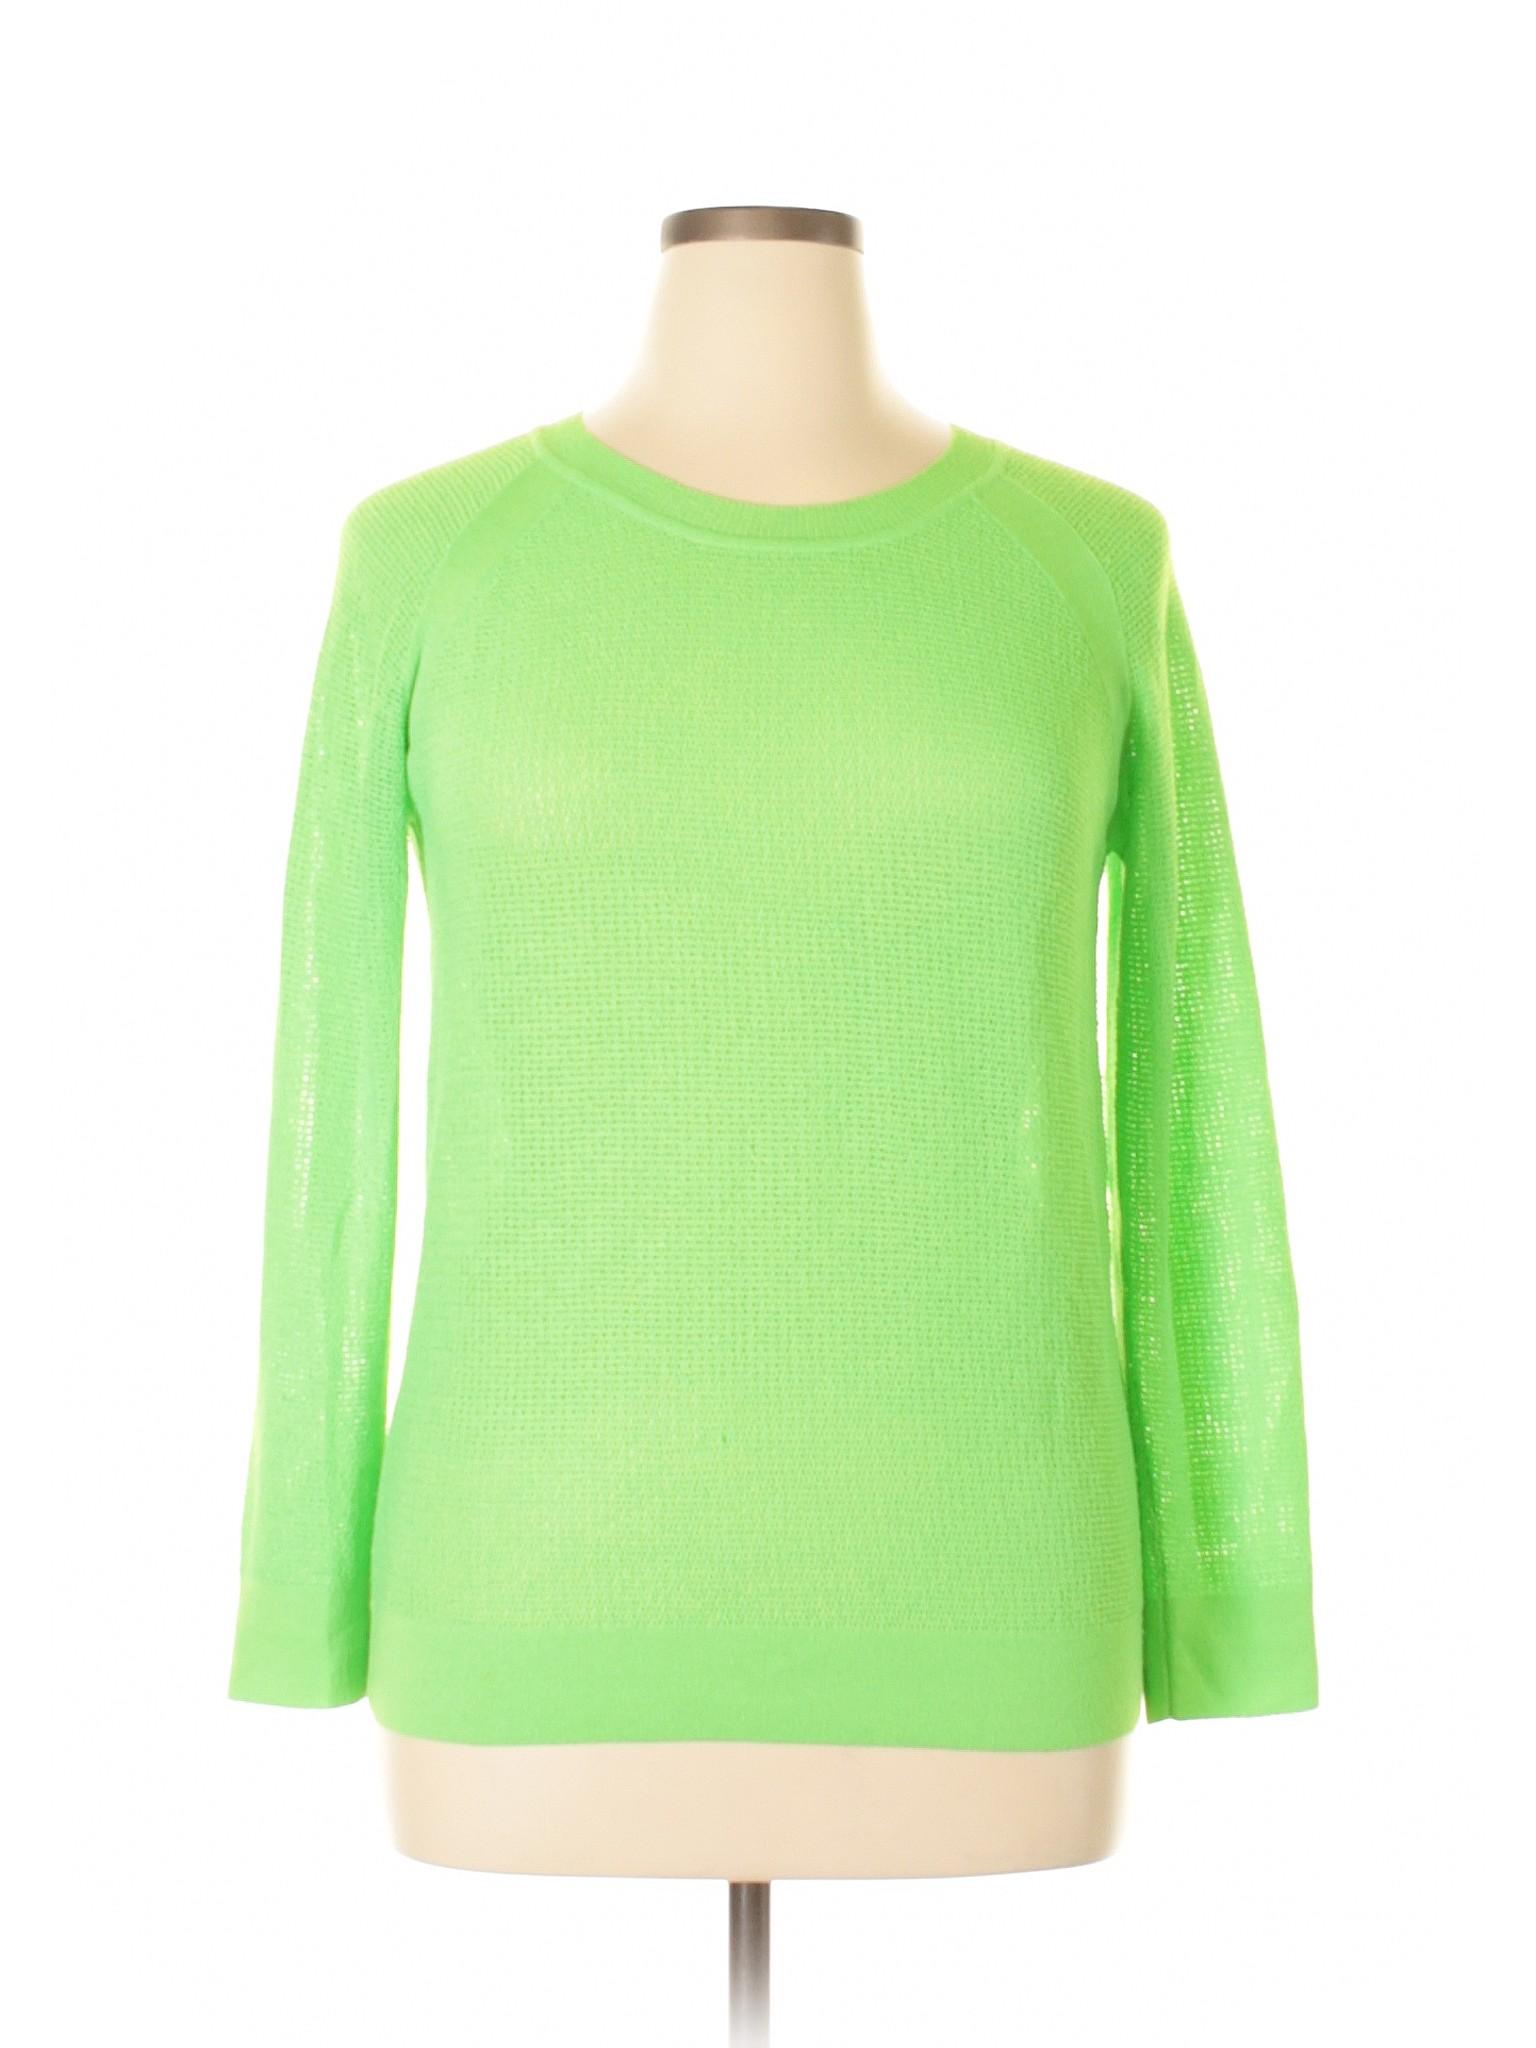 Boutique Pullover Elliott Lauren winter Sweater OqOnP7w